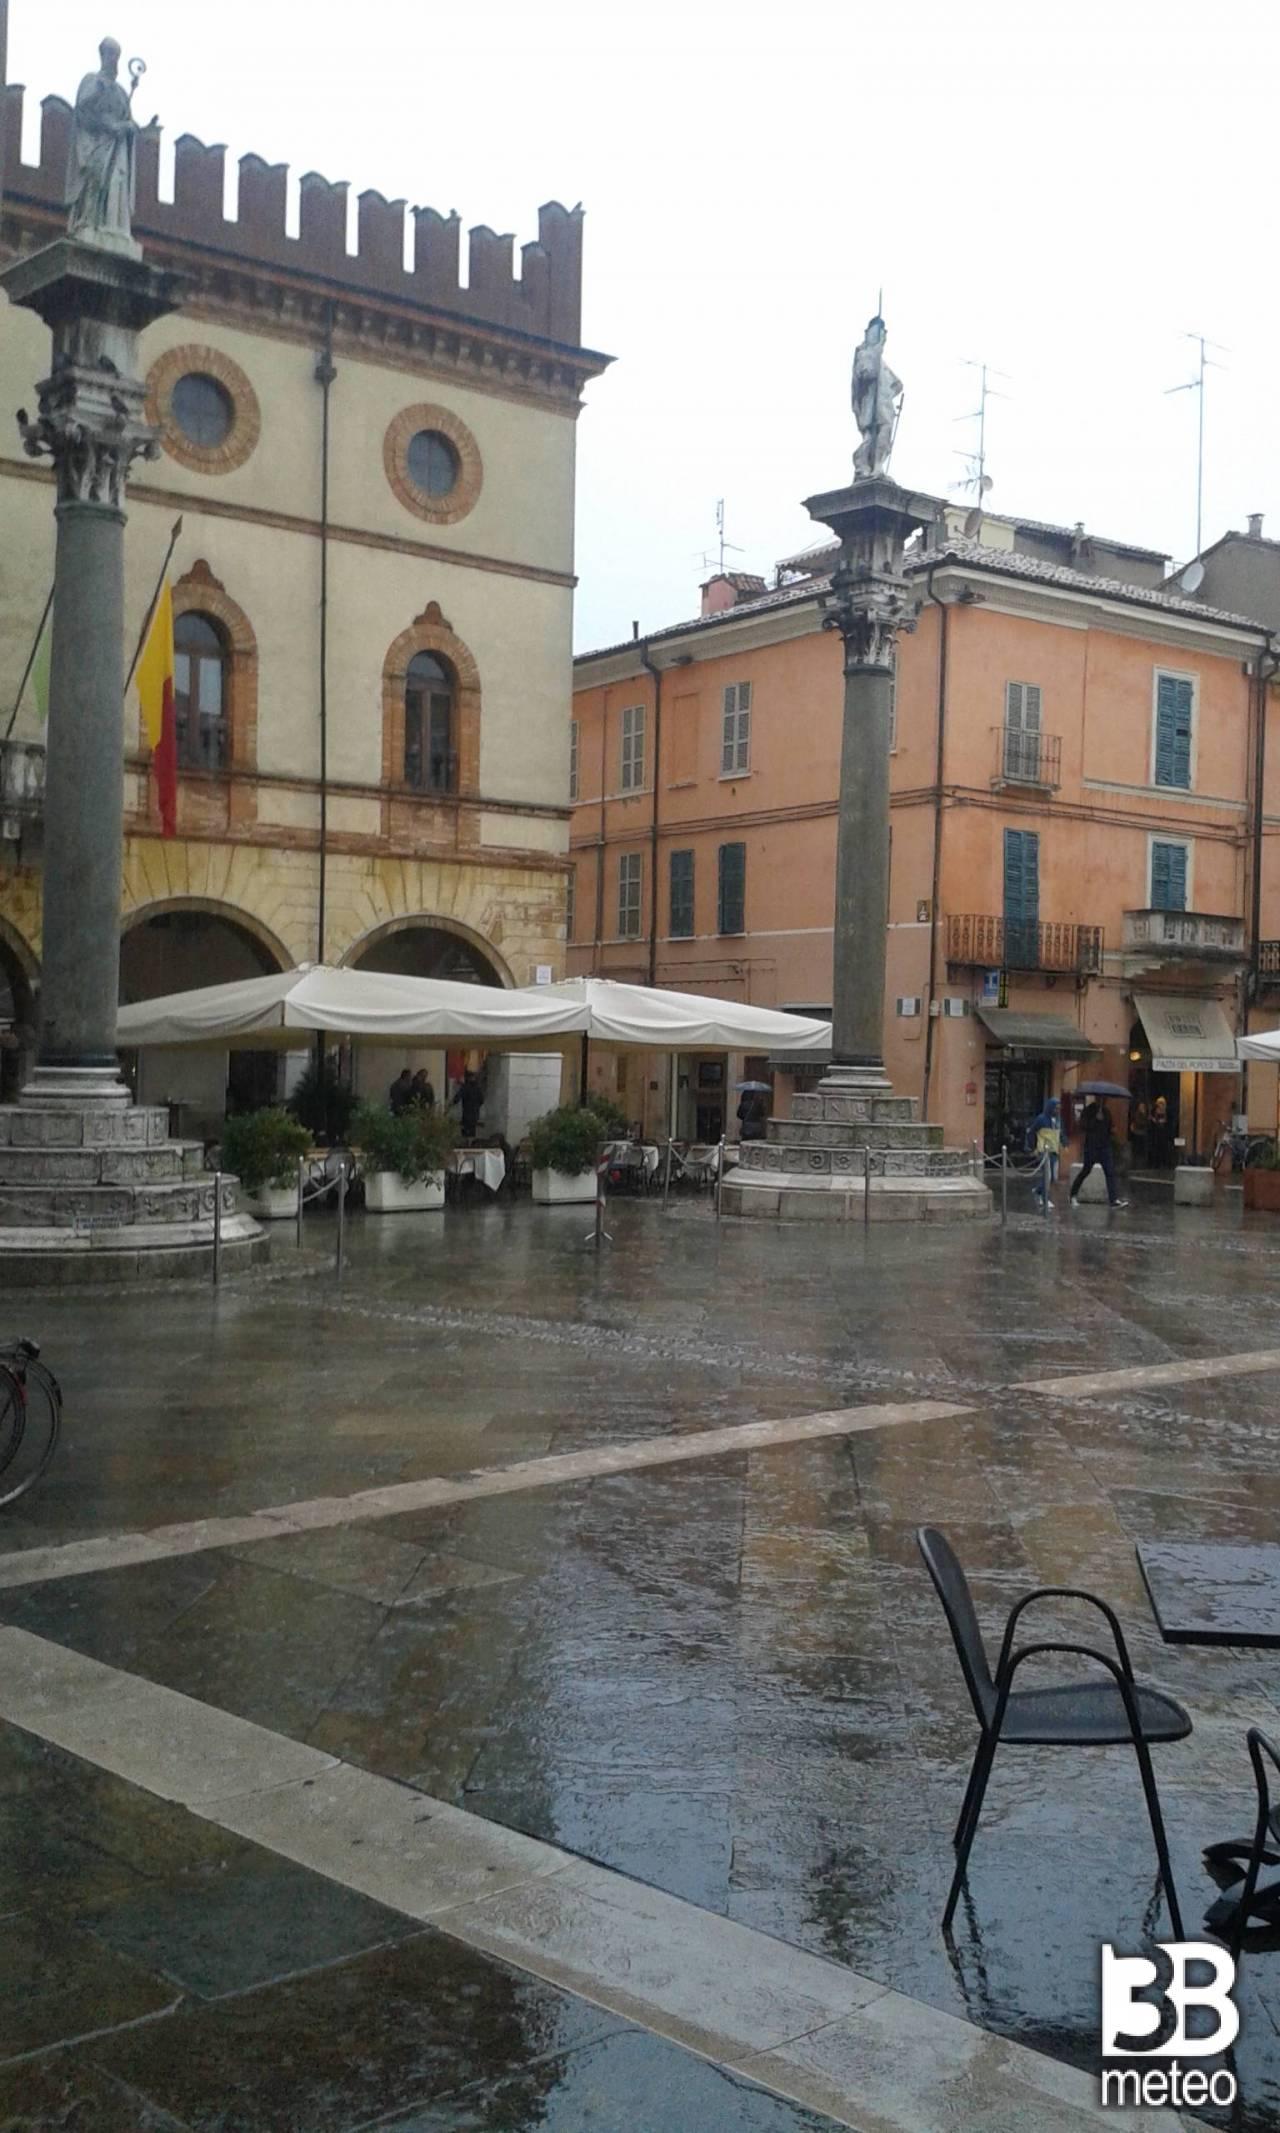 Meteo Ravenna: lunedì bel tempo, poi piogge - 3bmeteo